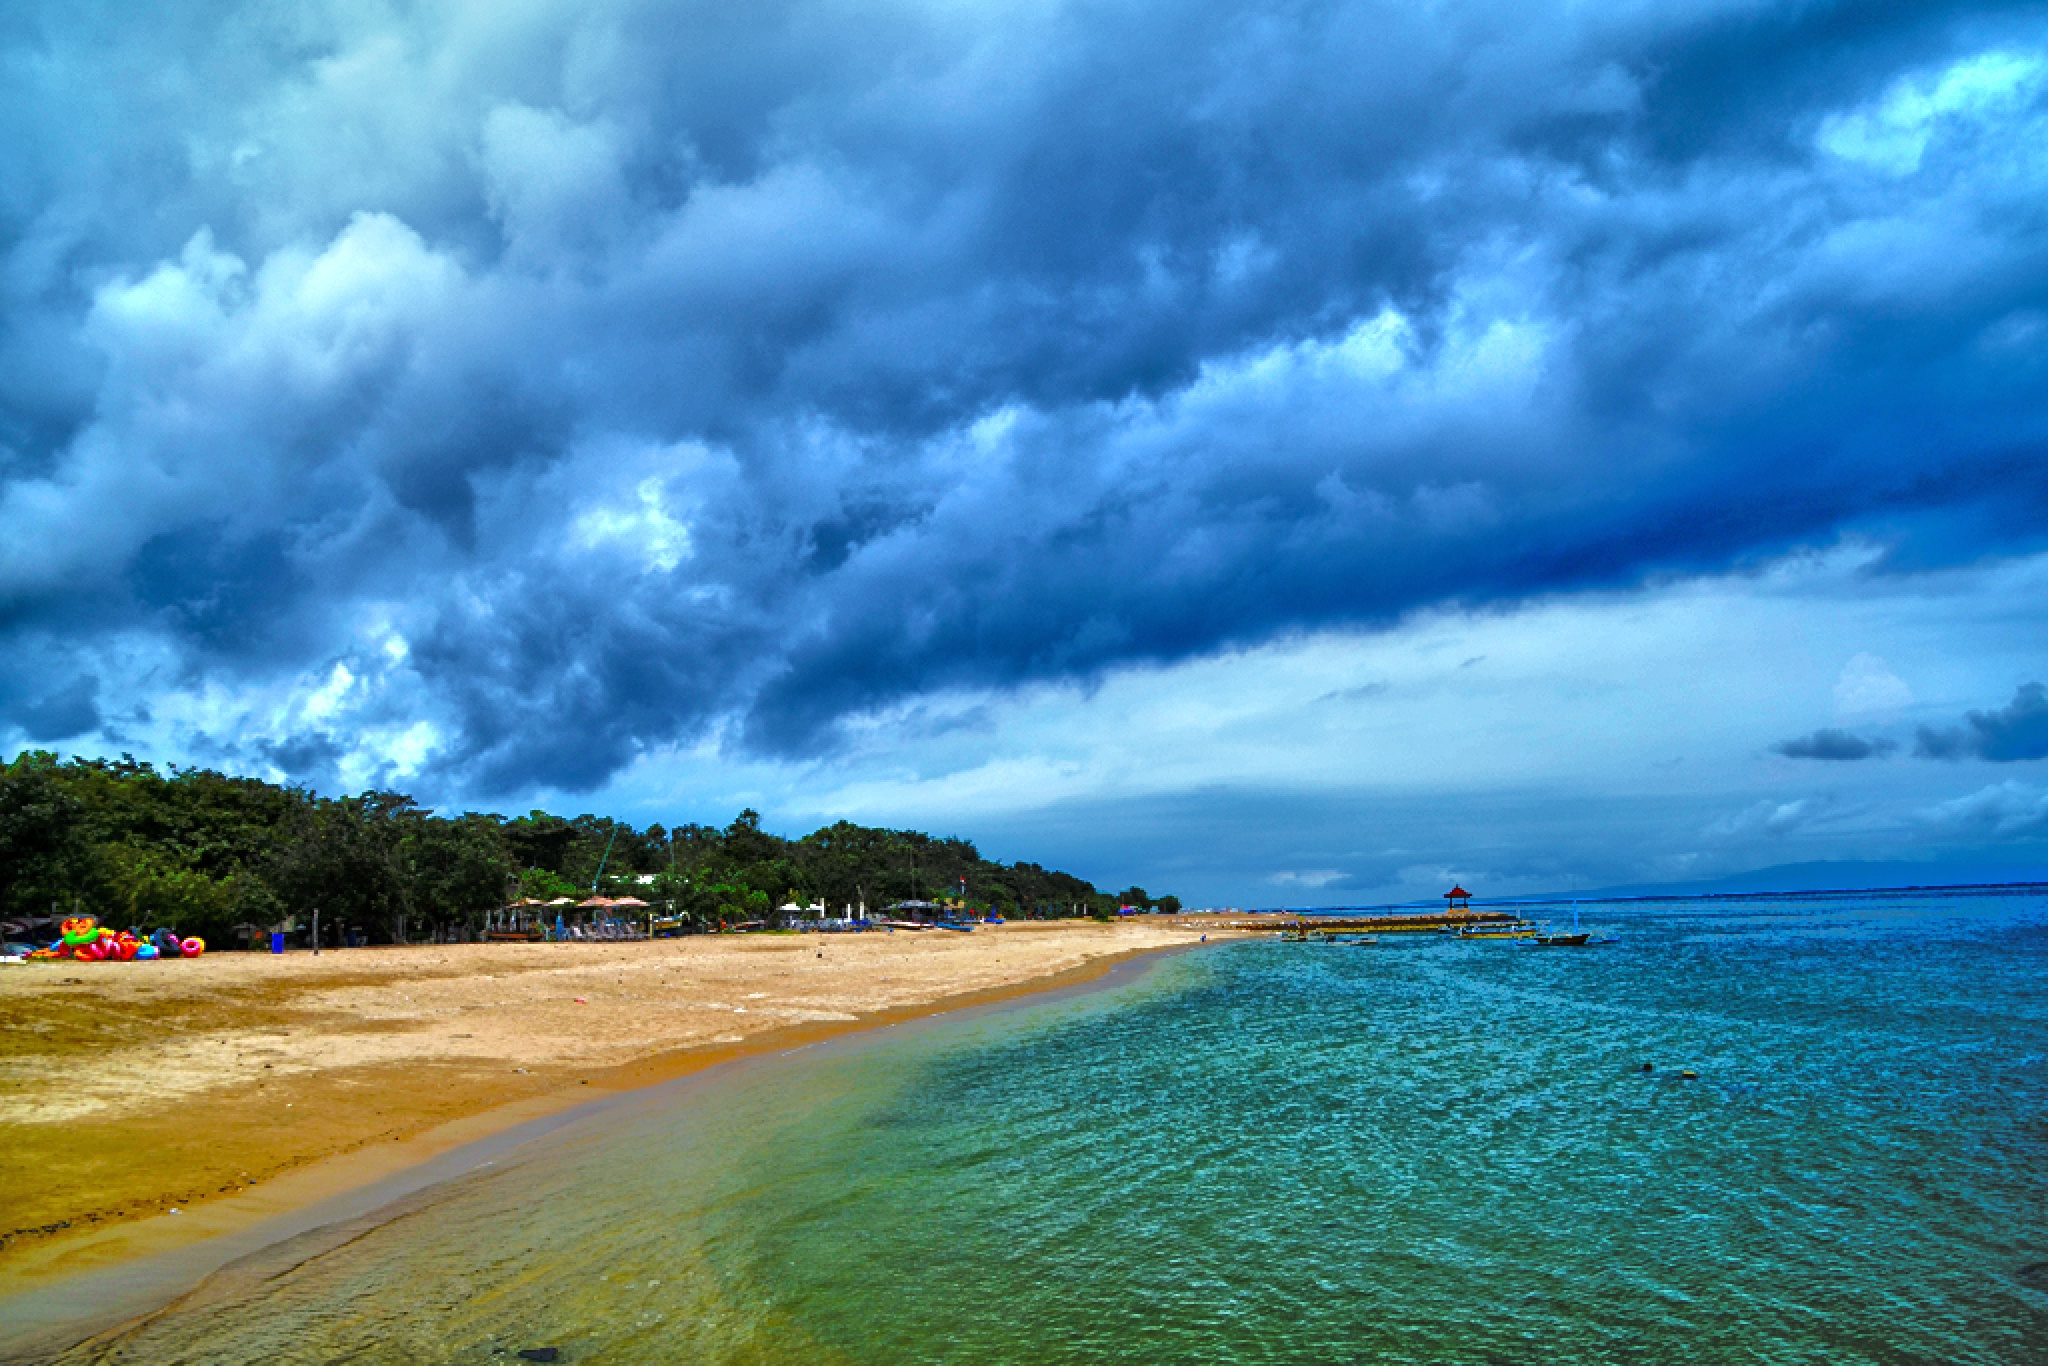 beach by dewaputra